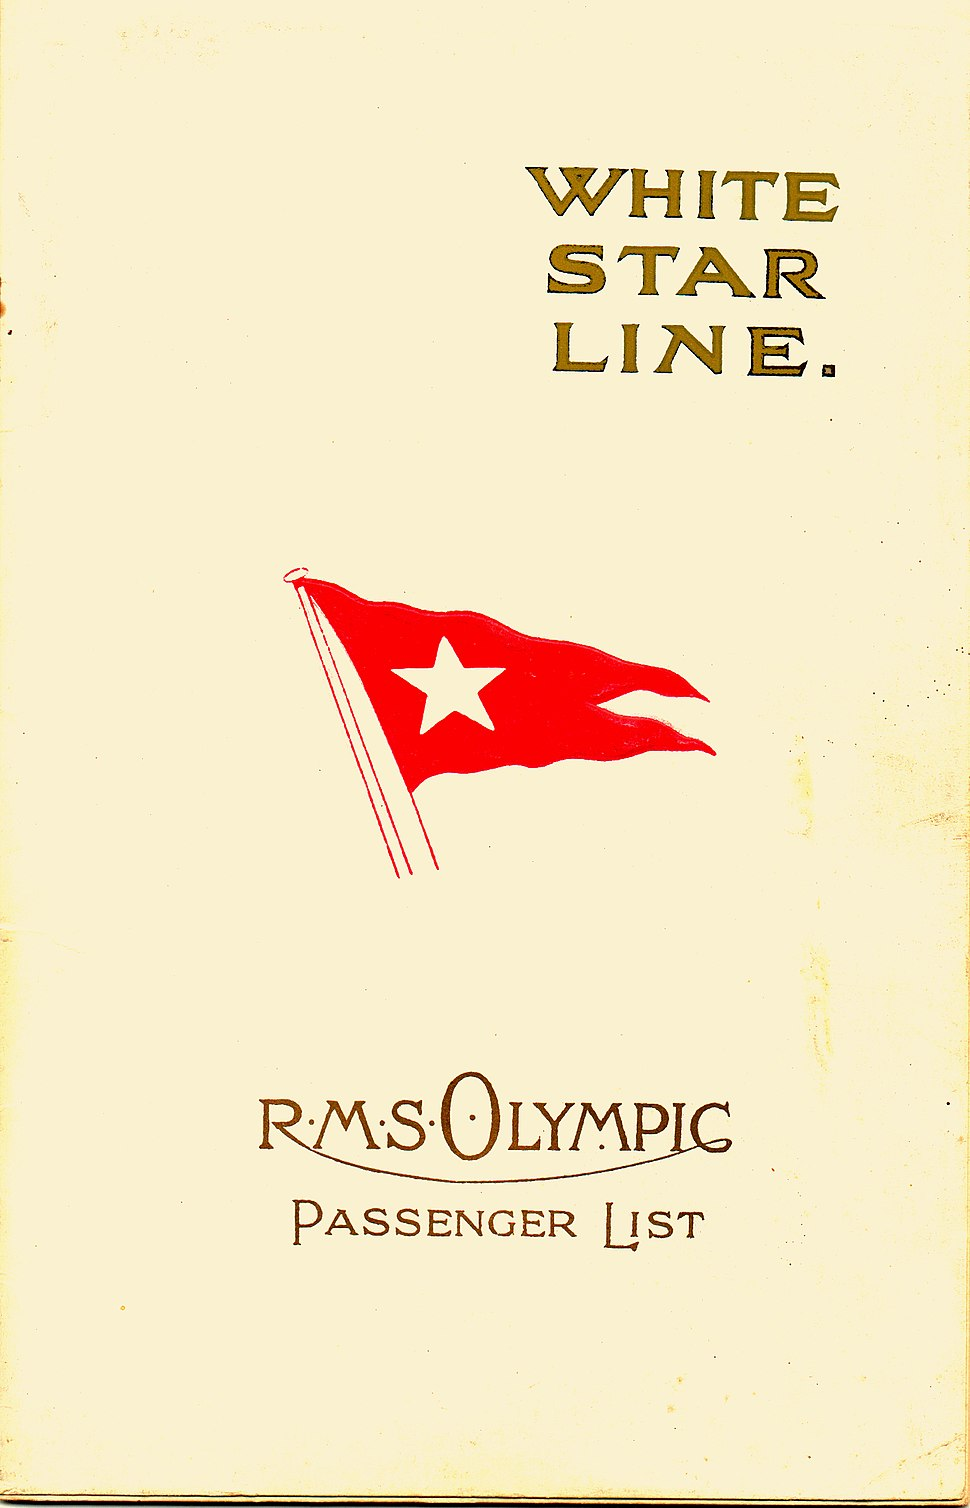 RMS Olympic Passenger List 1923